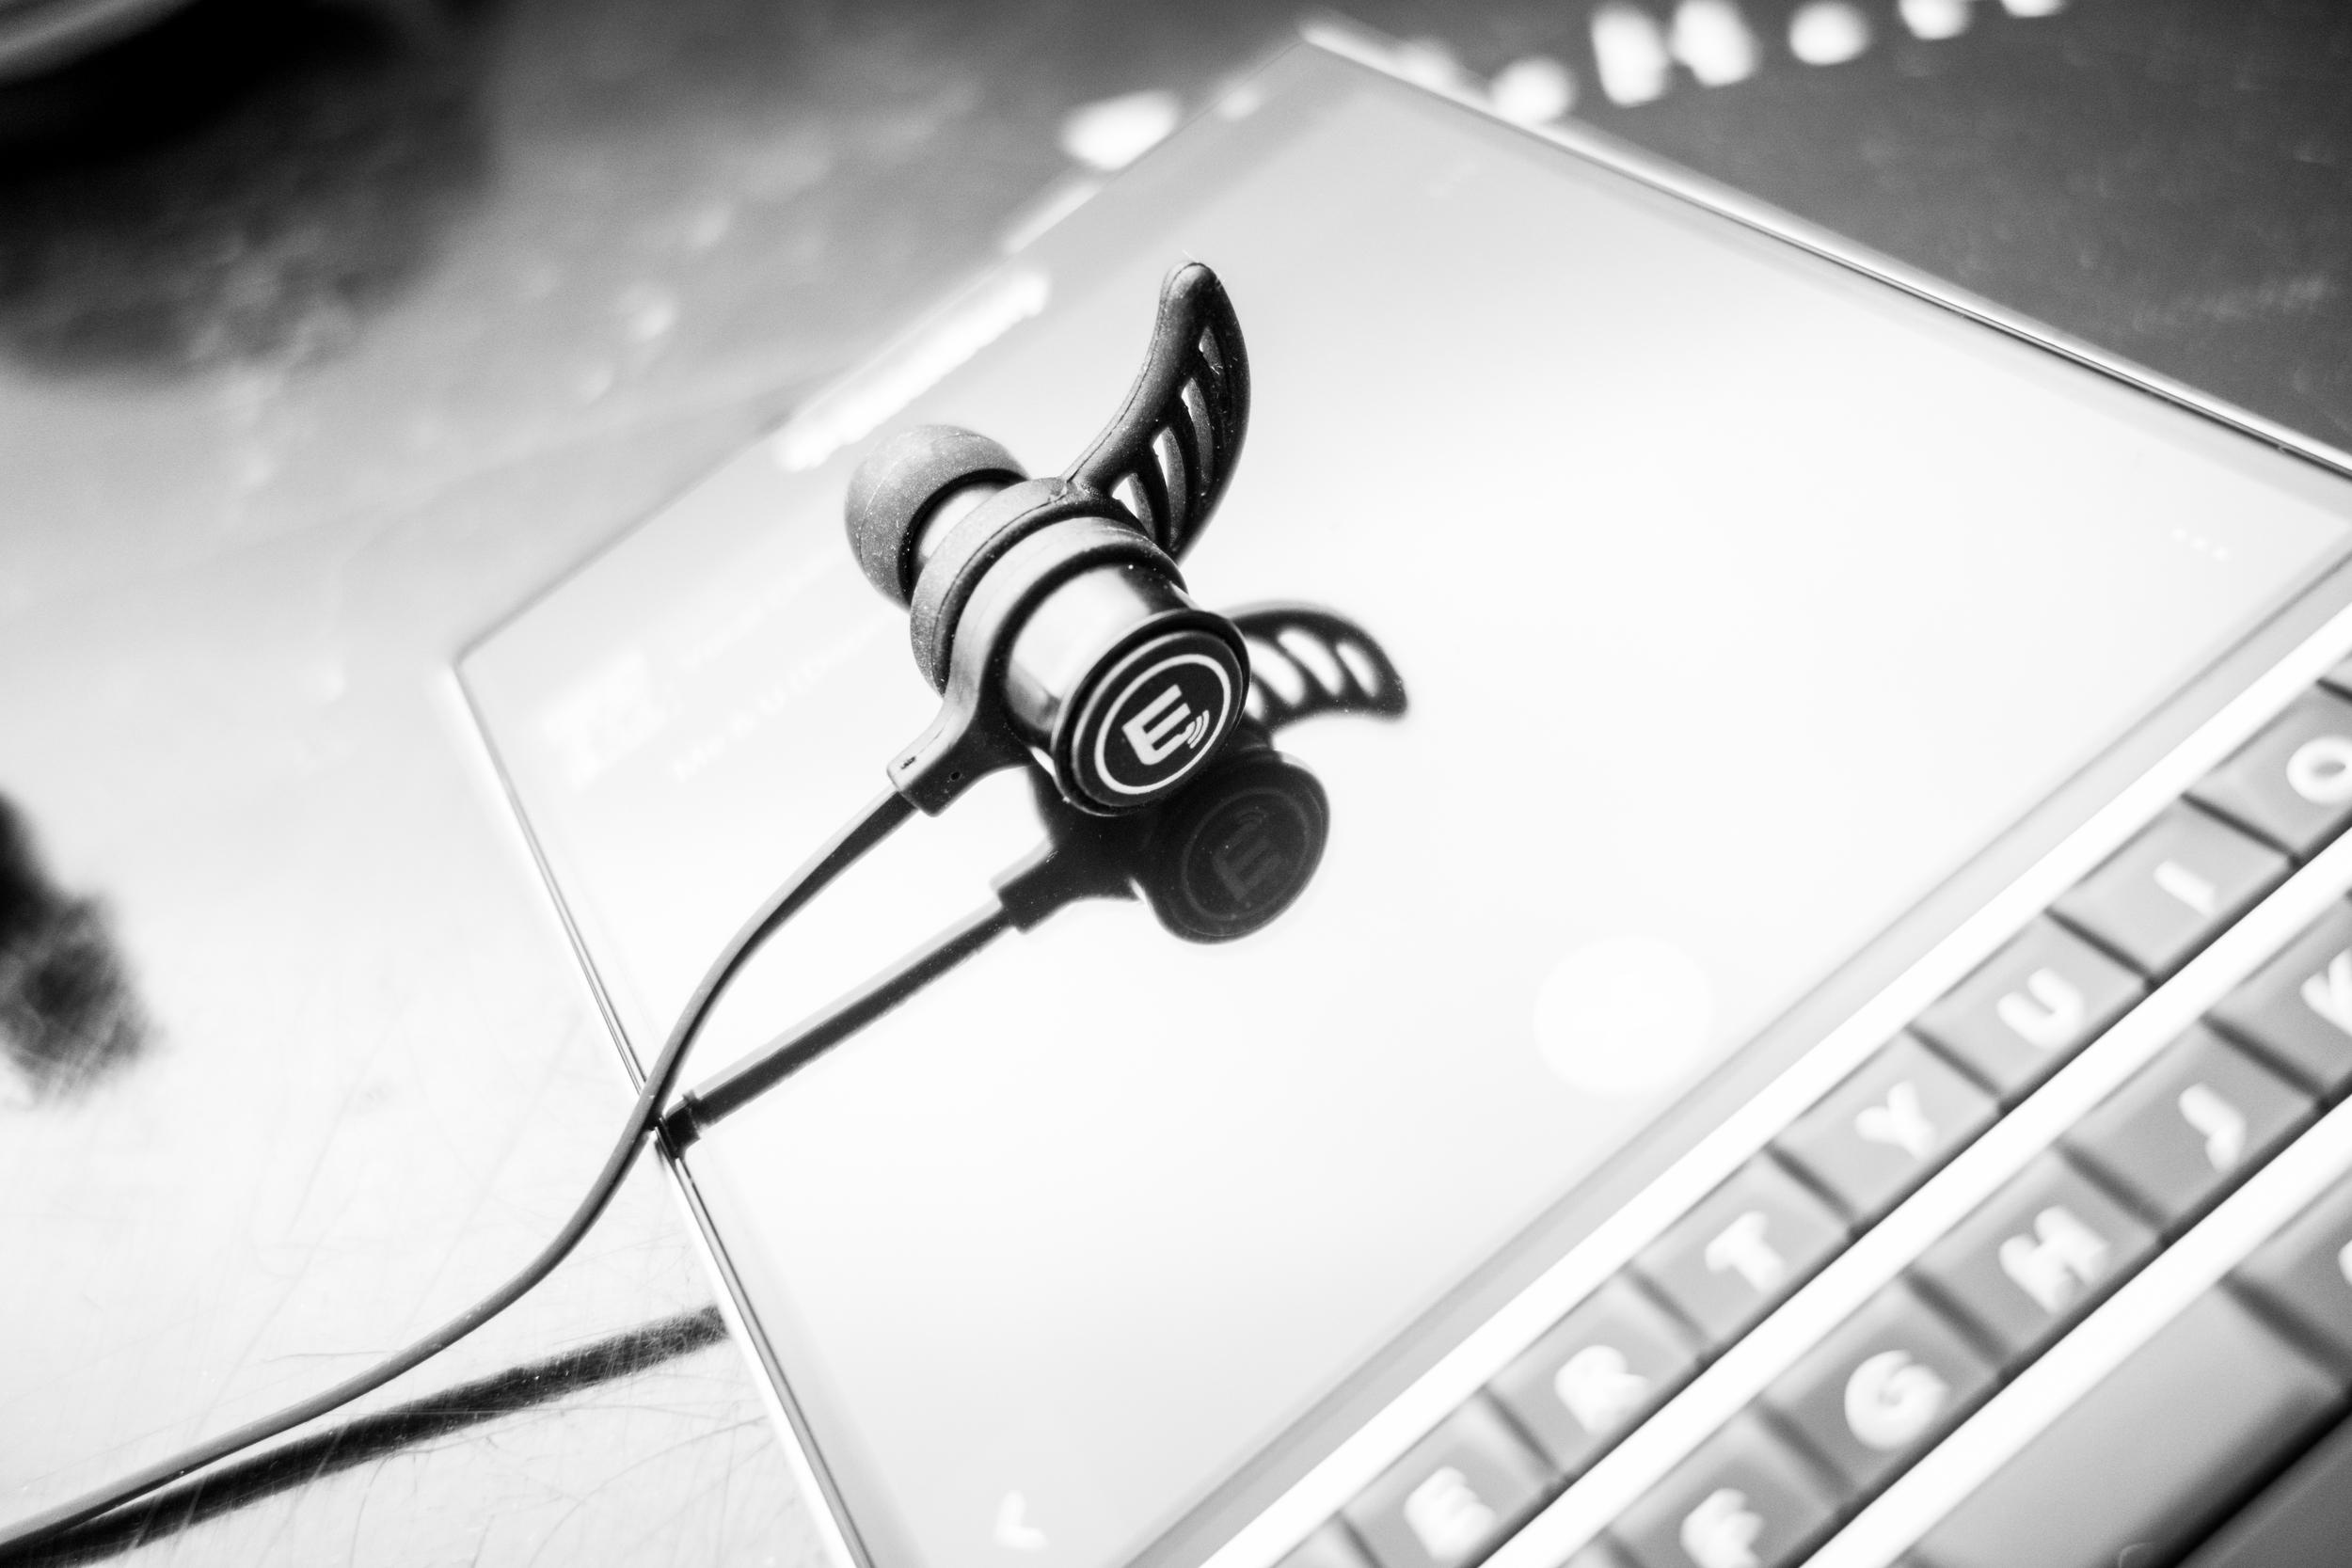 The Brainwavz BLU-100 earhooks help to keep the your wireless IEM's in place